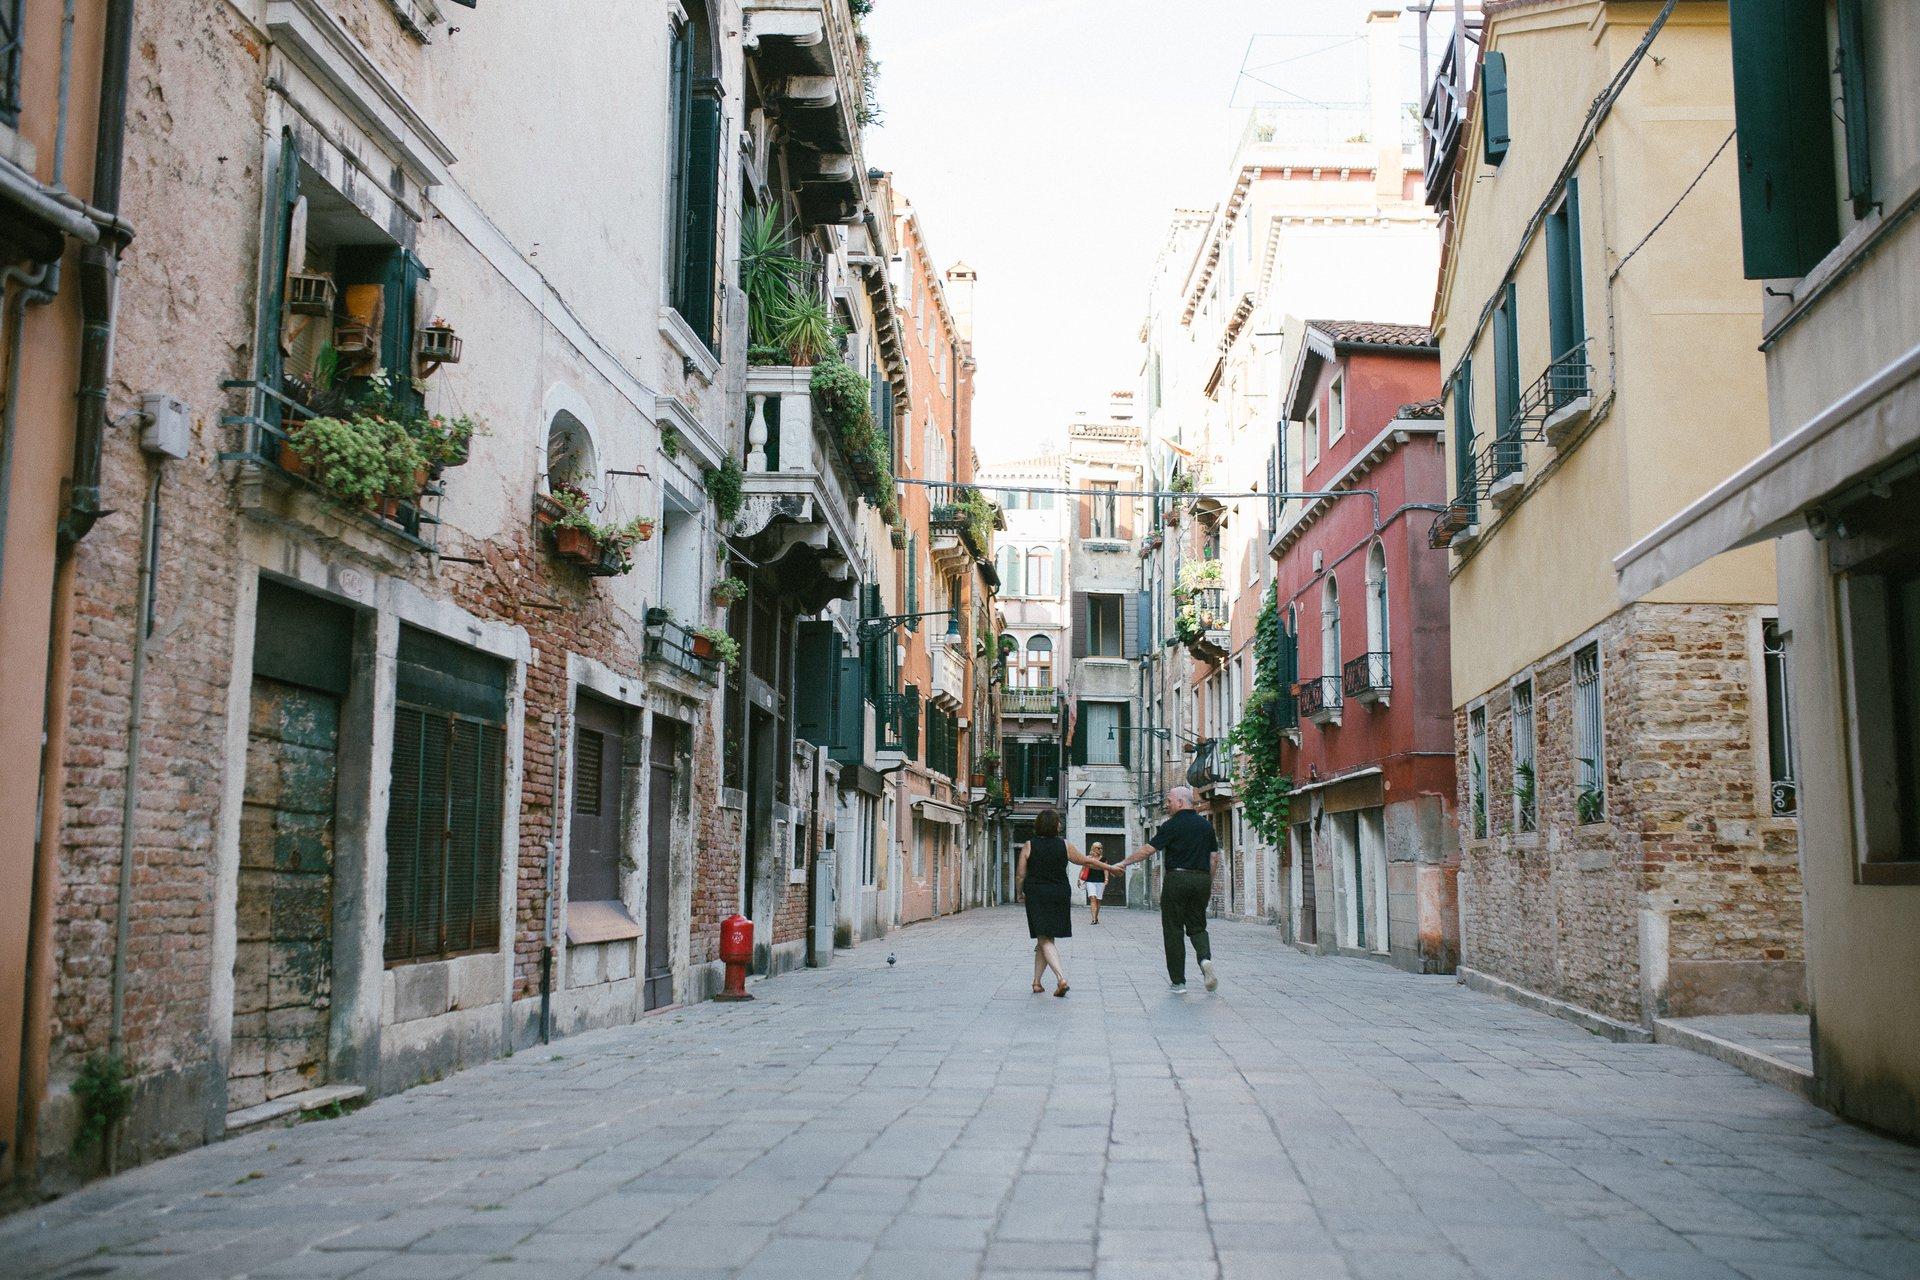 Venice-Italy-travel-story-Flytographer-21